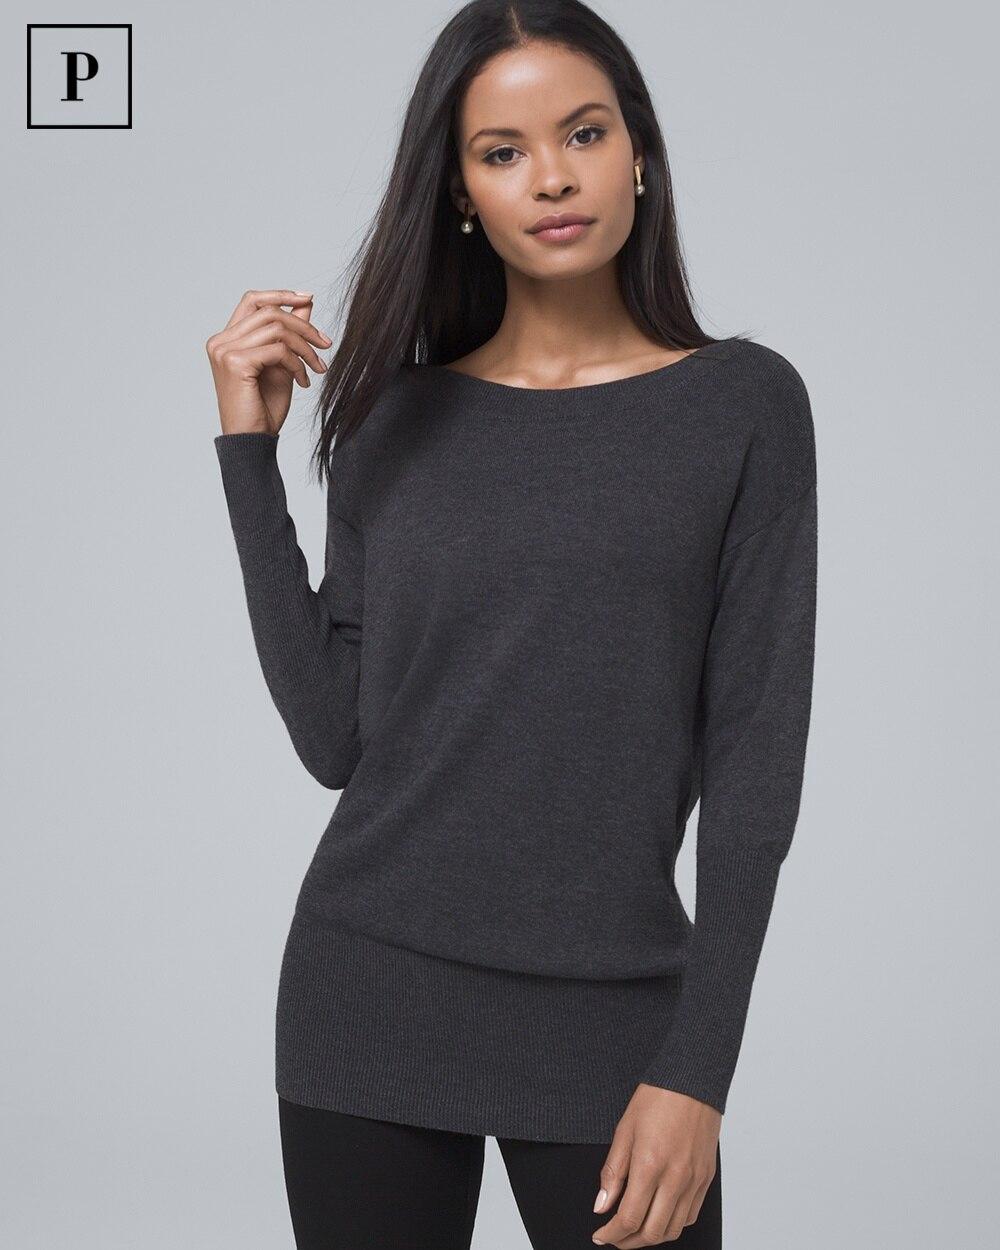 82d85fc8ad1 Shop Petite Sweaters For Women - Cardigans